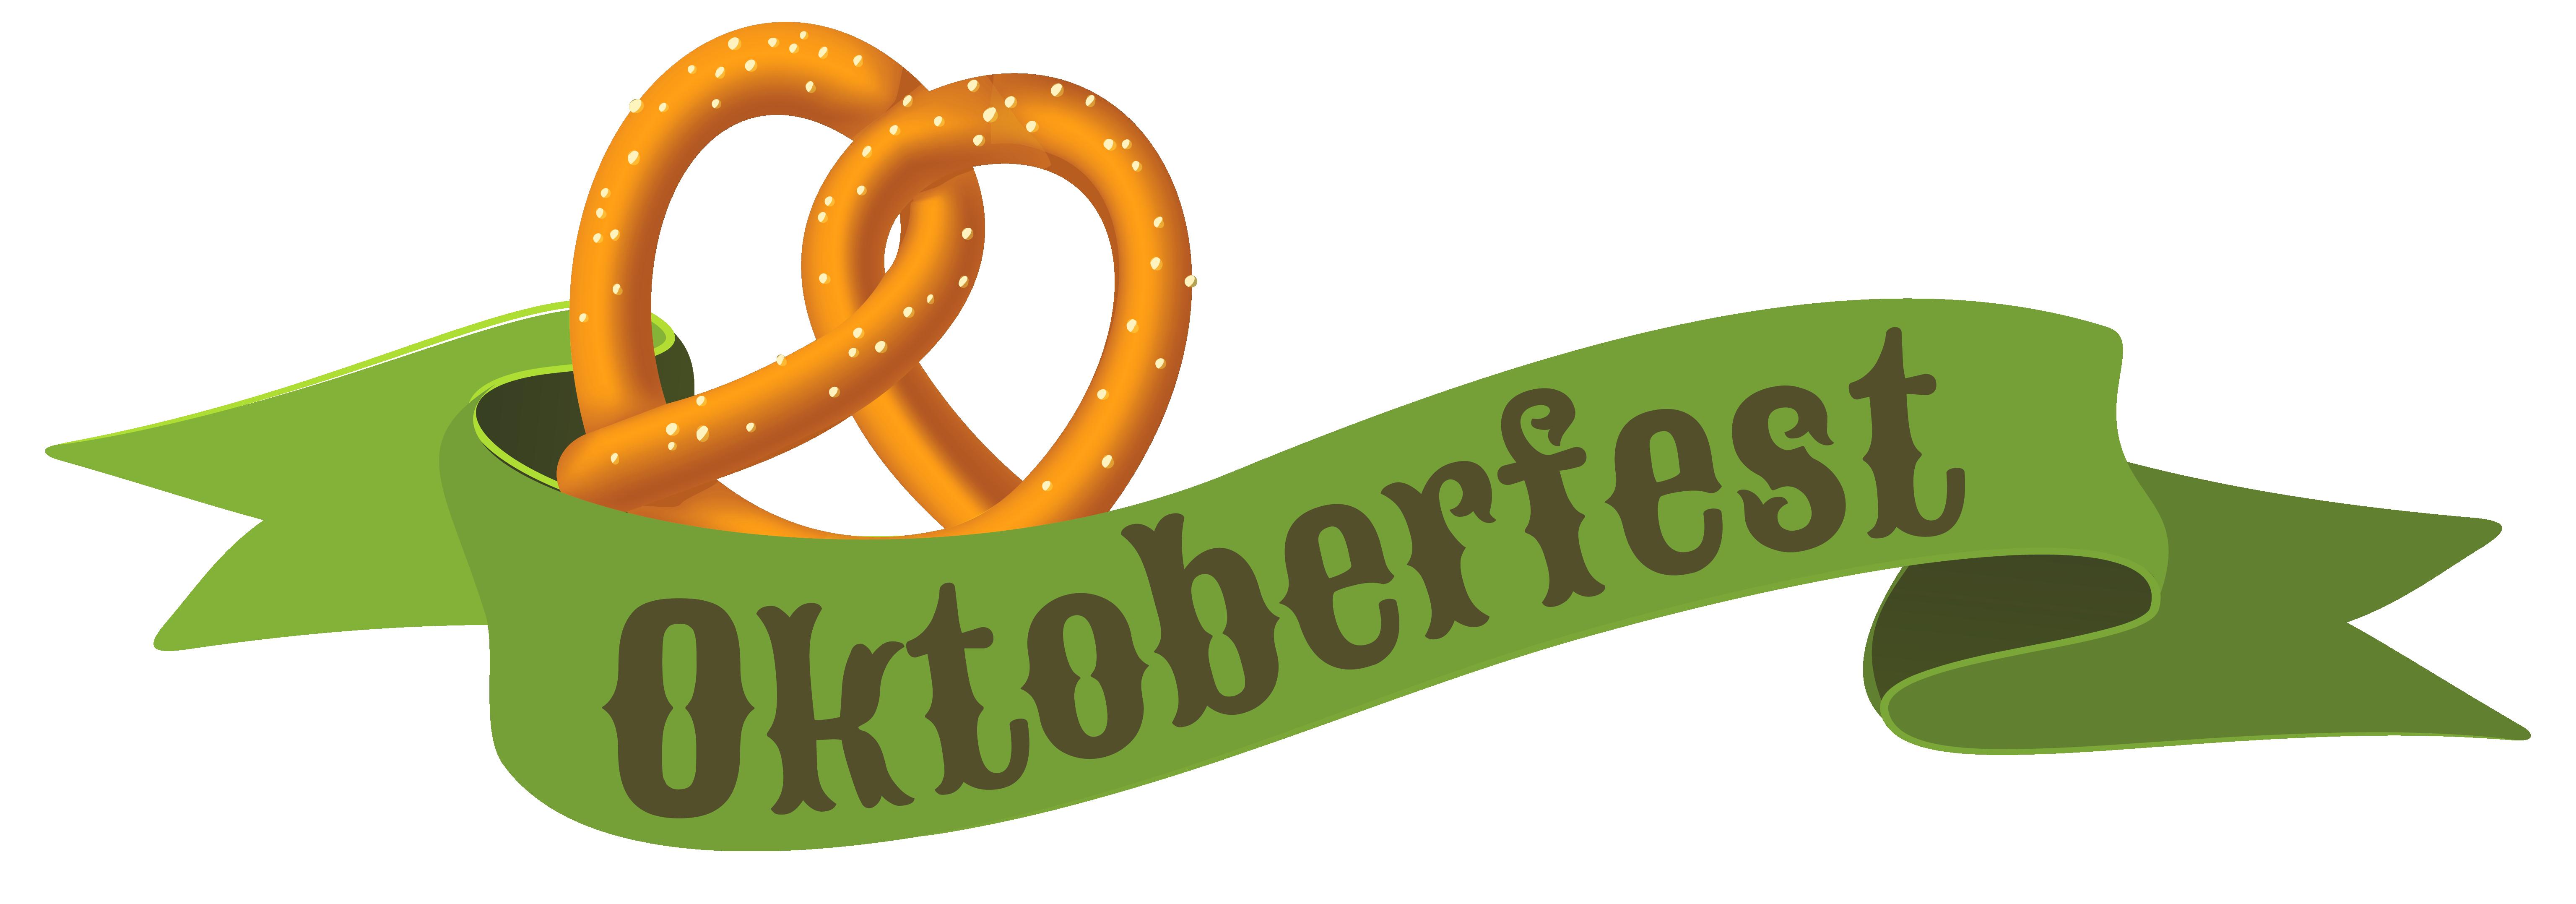 Oktoberfest clipart - ClipartFest